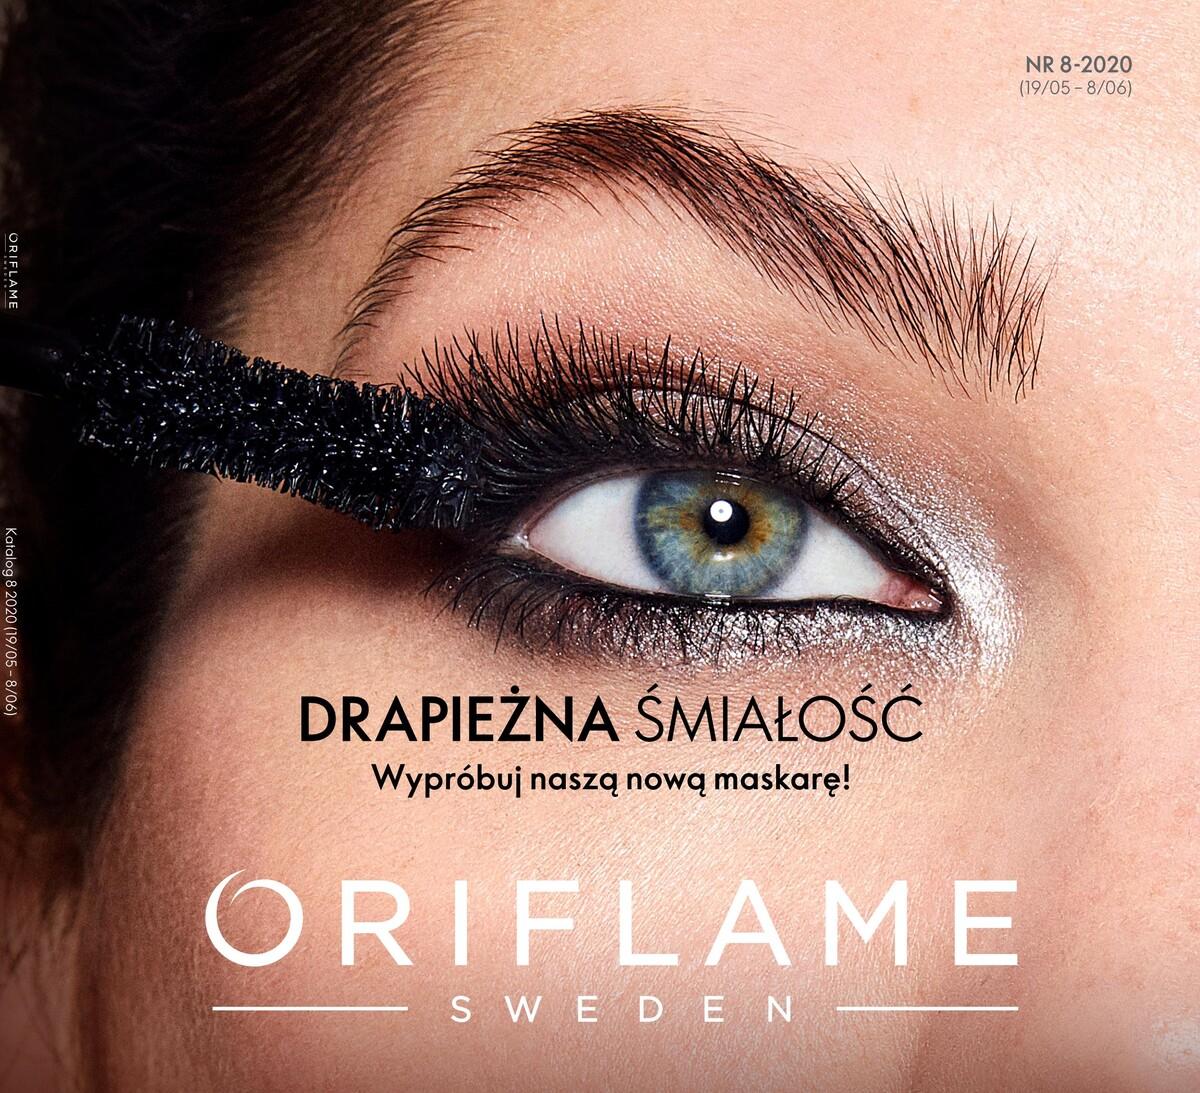 Gazetka Oriflame - Katalog nr 08-2020